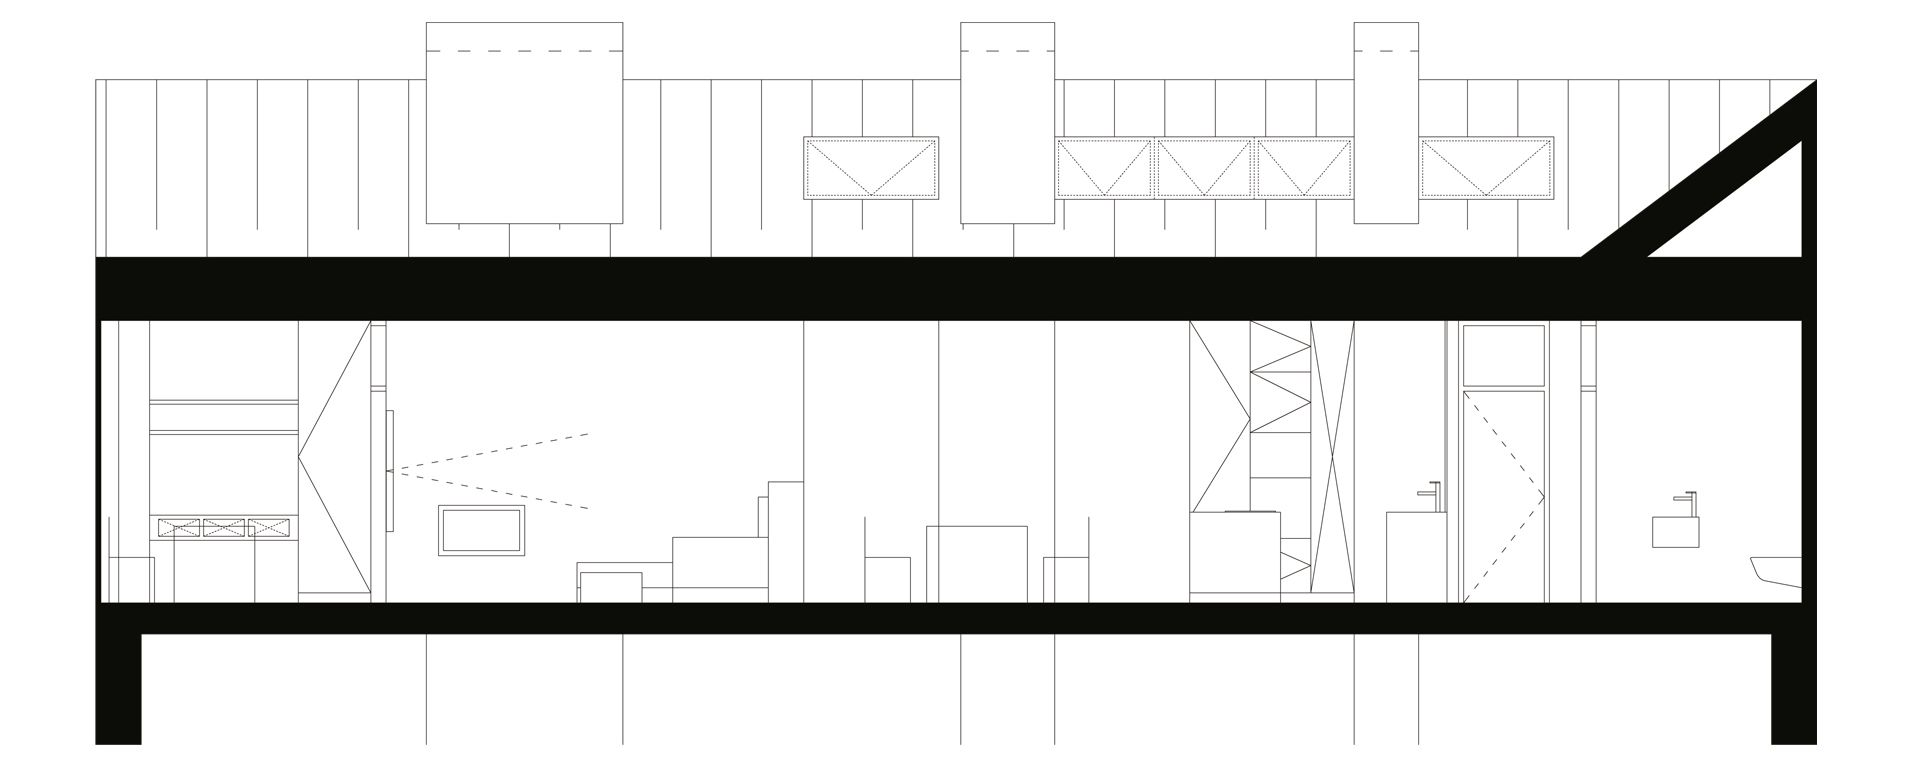 Rekonstrukce bytu, Praha 7 Letná, 2012 -2014, CZ